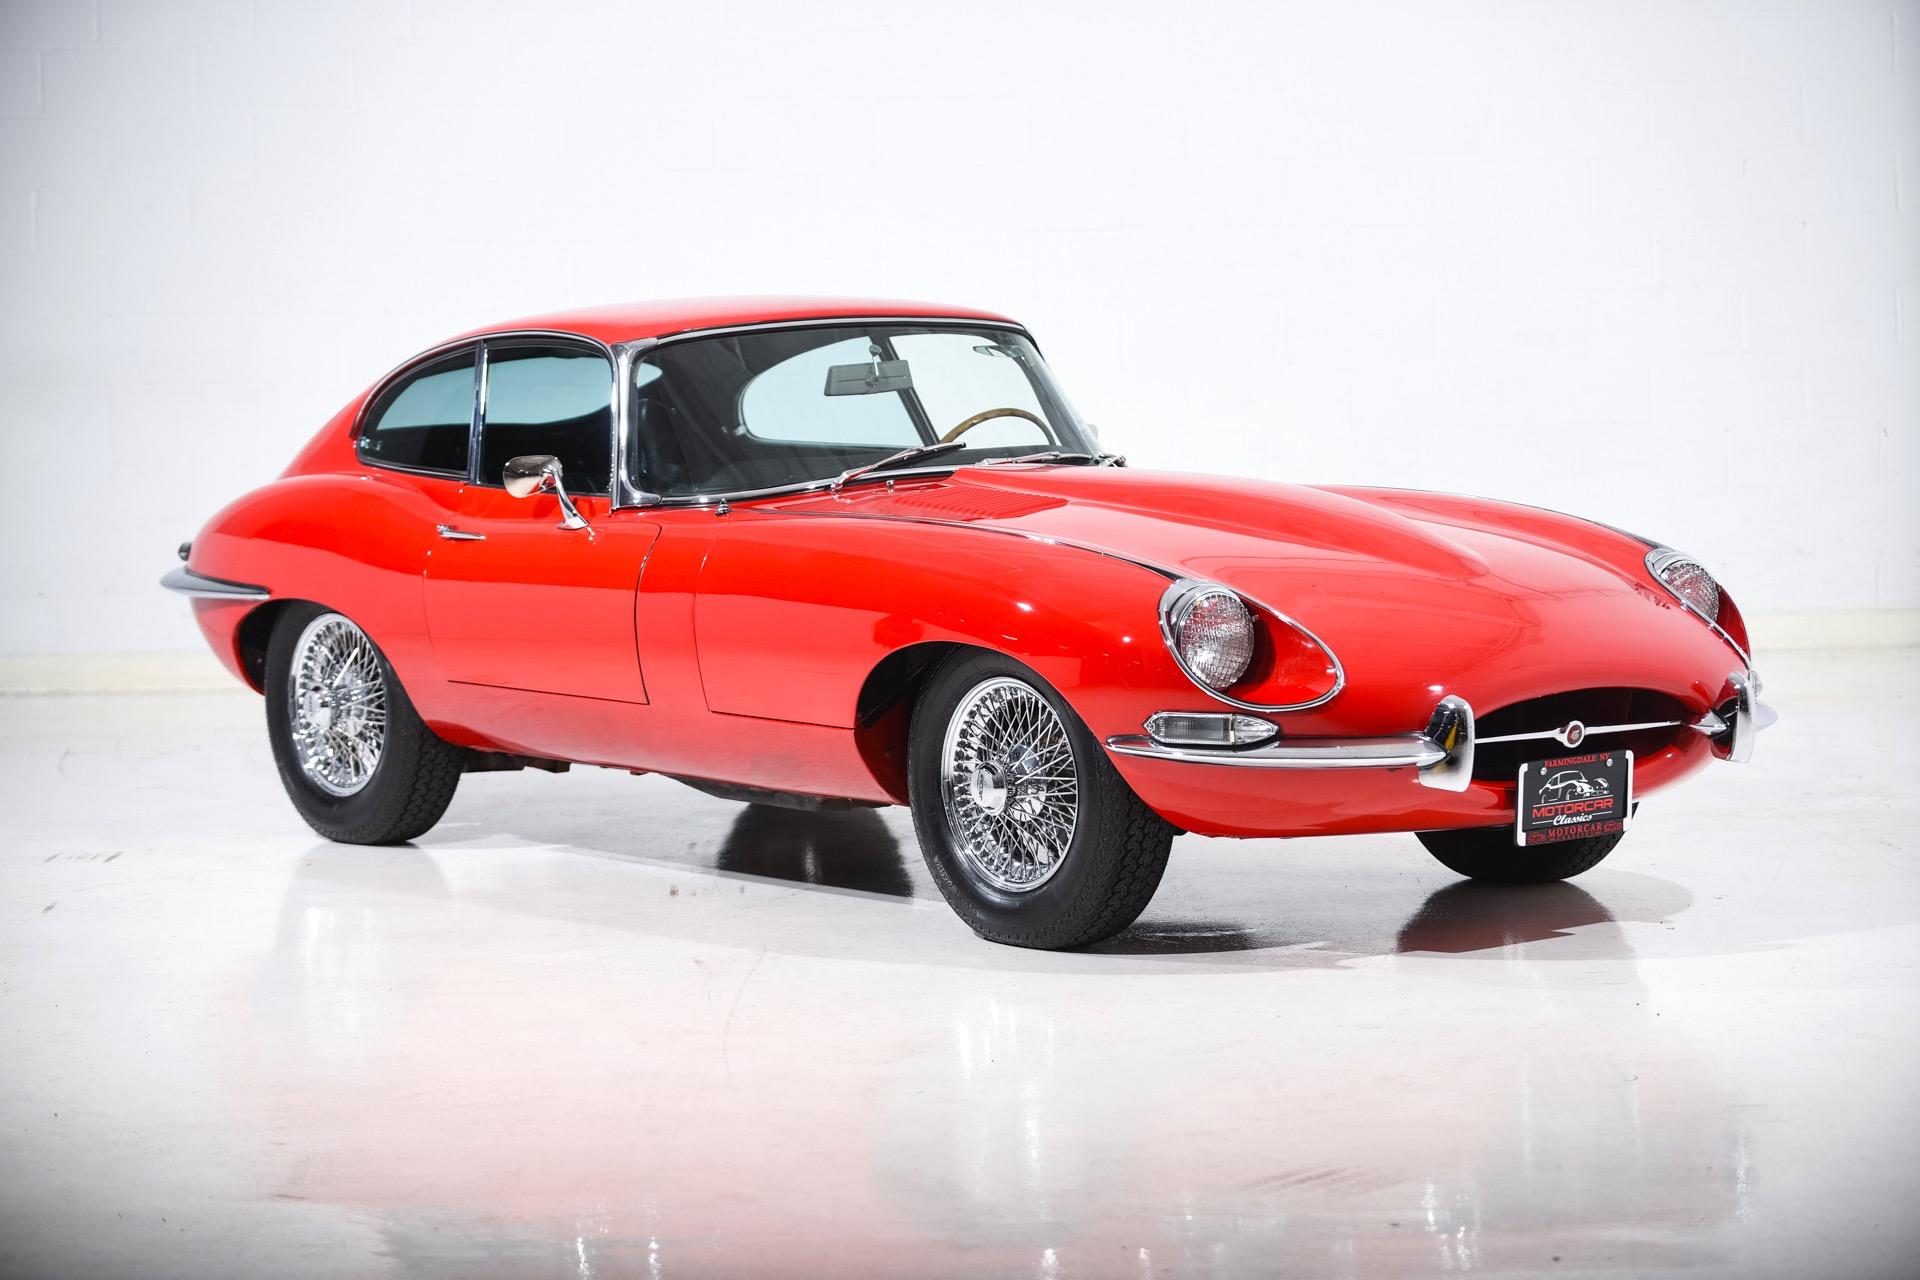 Photo 1968 Jaguar XK-Series XKE 4 Seat Coupe RWD